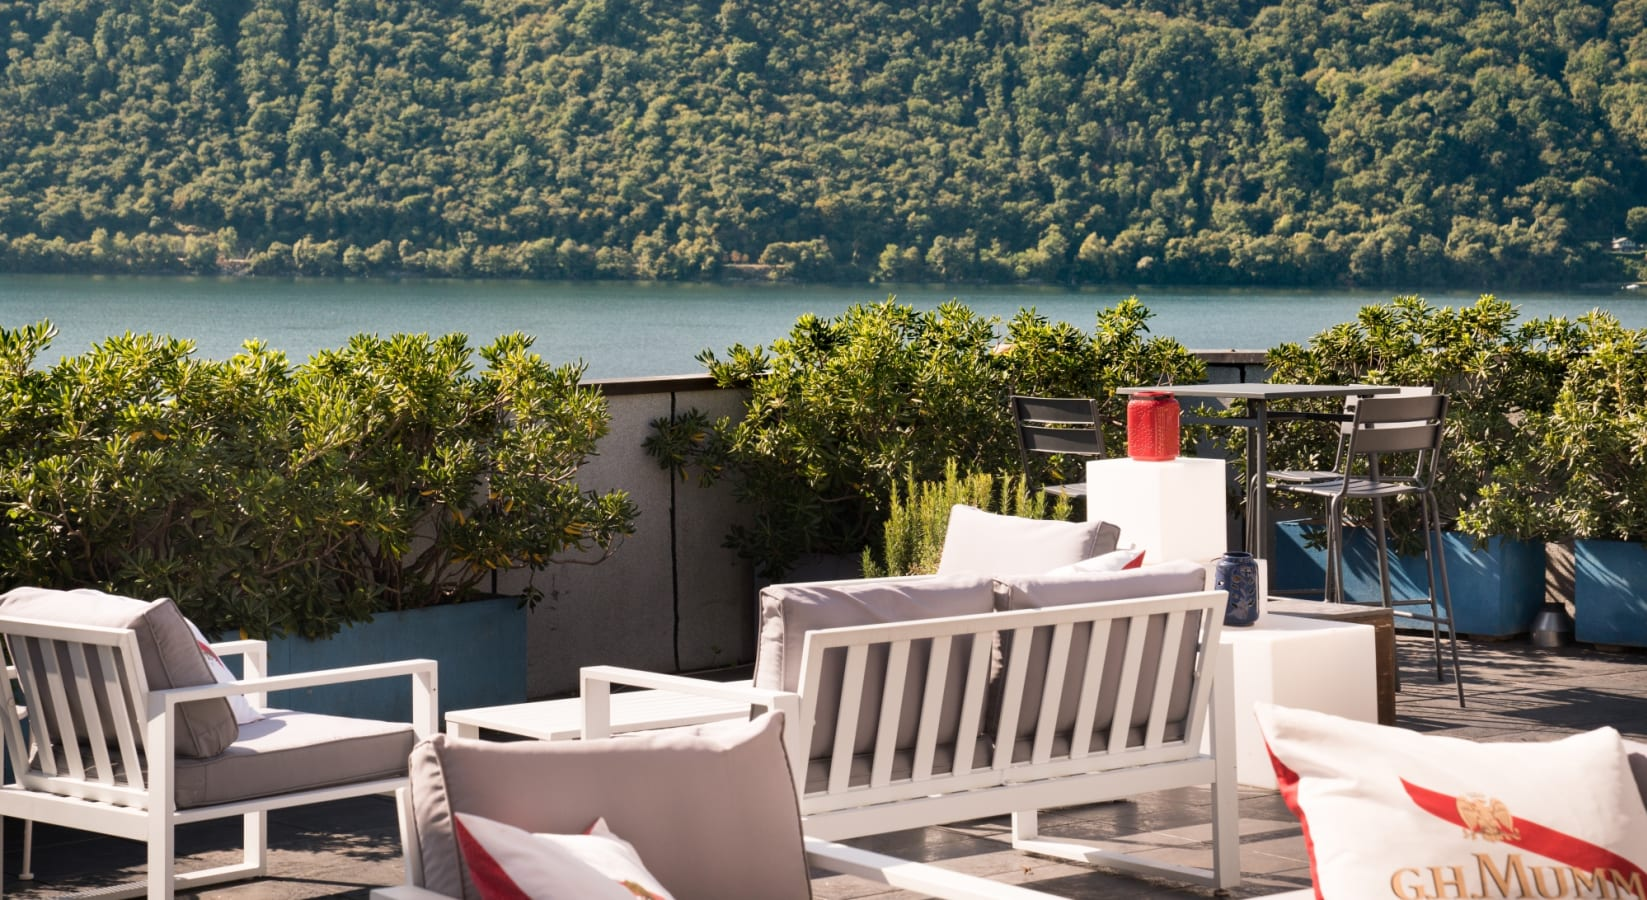 Rooftop Relax Bar c/o Hotel Ristorante Giardinetto